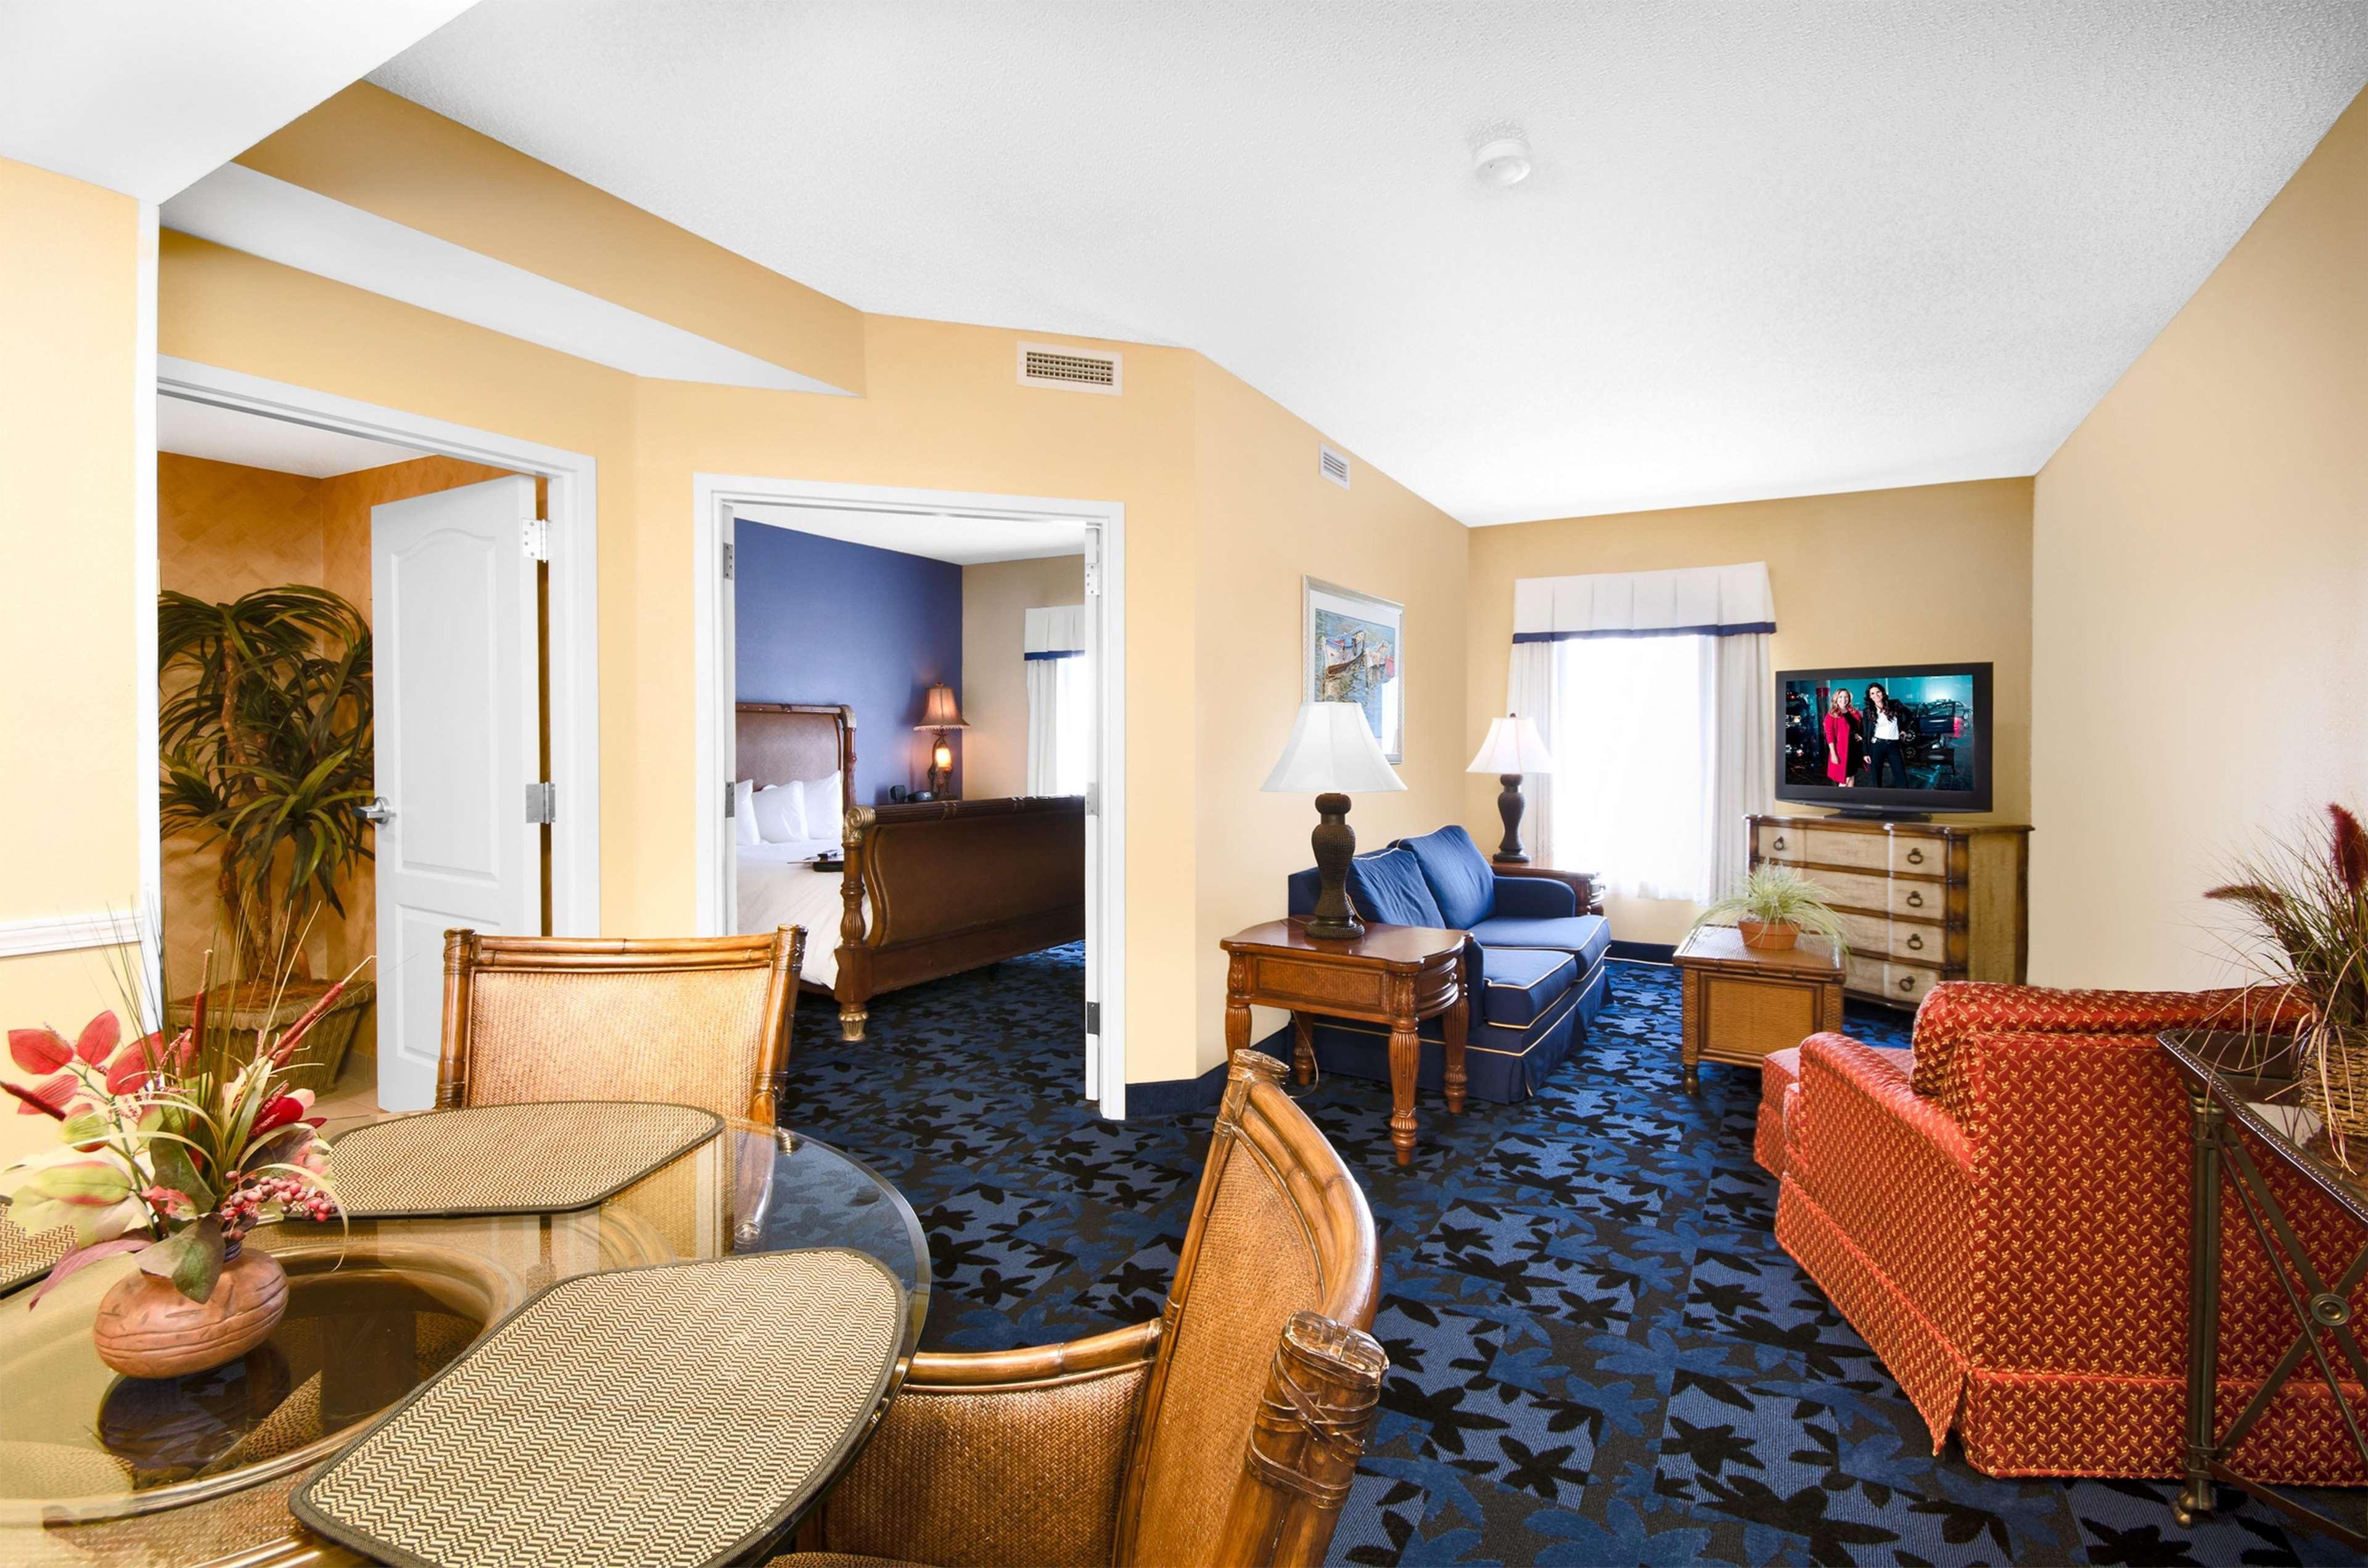 Hampton Inn & Suites Jacksonville South-St. Johns Town Center Area image 29